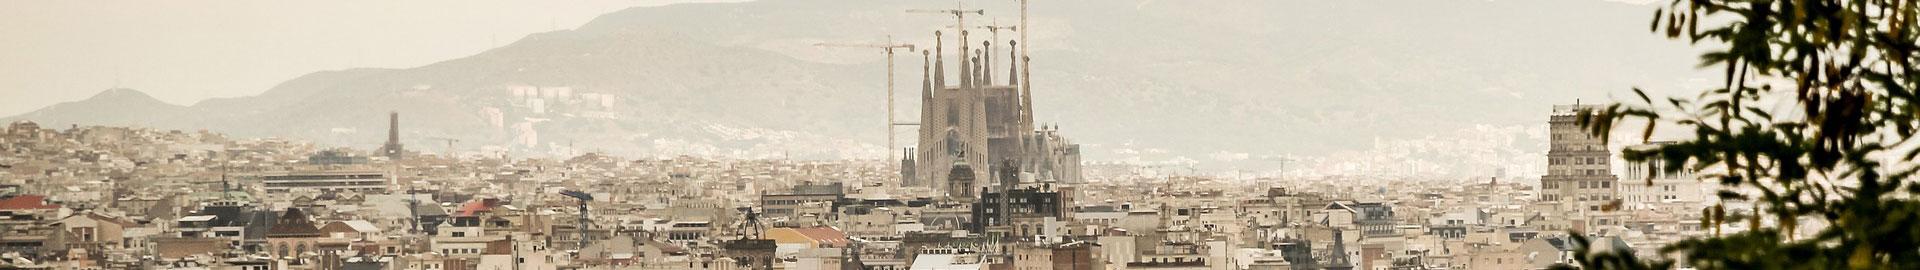 https://cestovnakancelariadaka.sk/files/product/x38-barcelona1.jpg